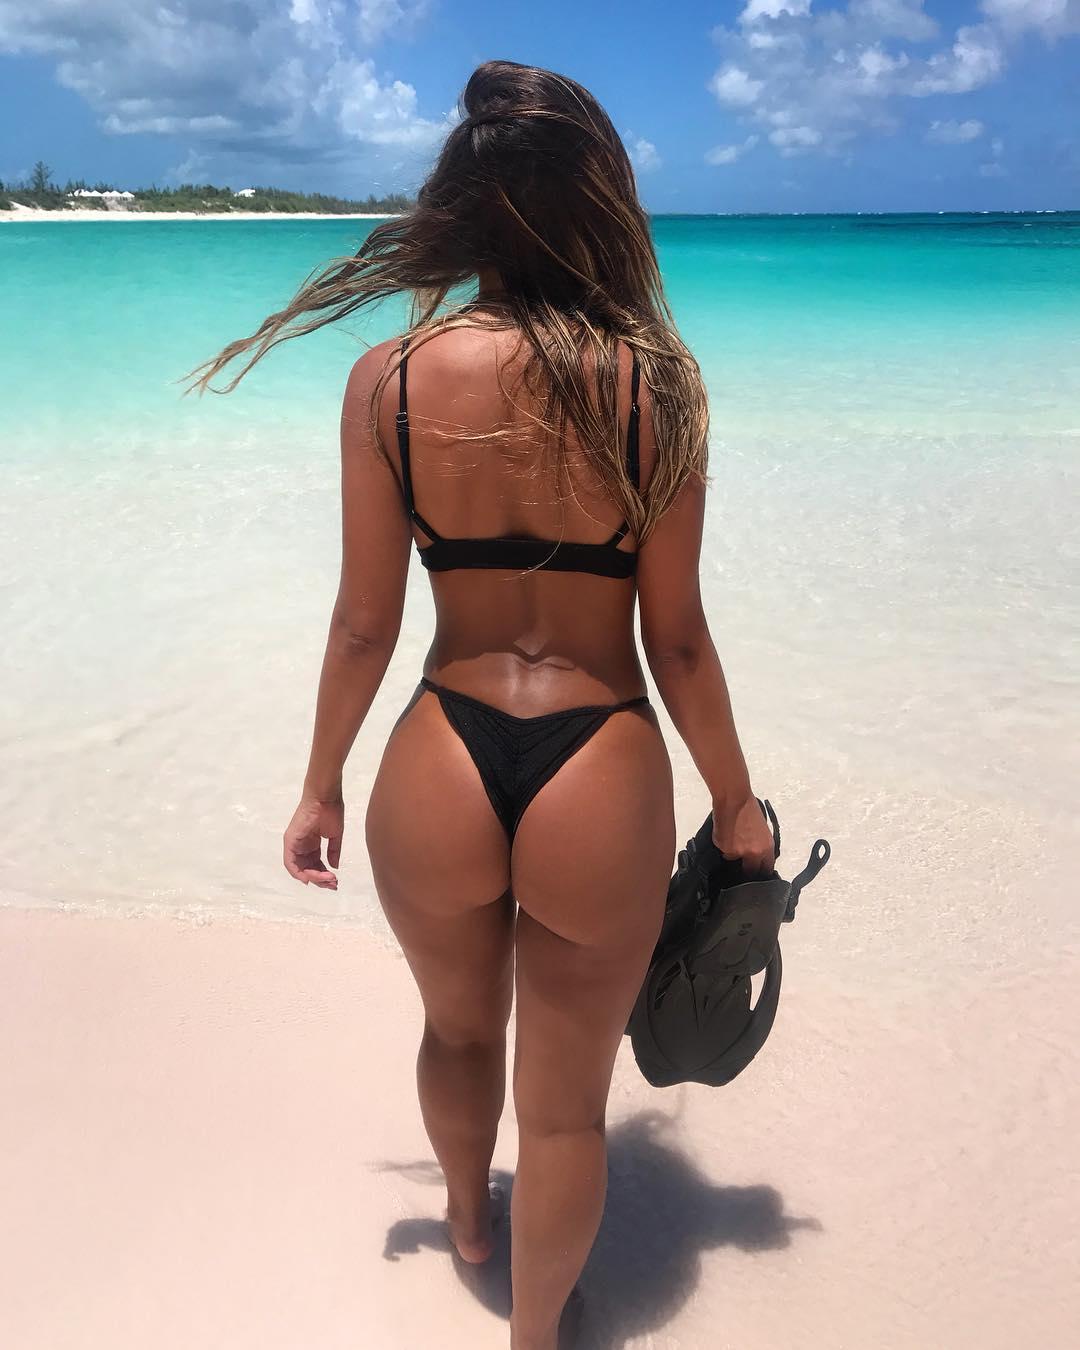 Natalia Garibotto Nude Onlyfans Leaked 0012